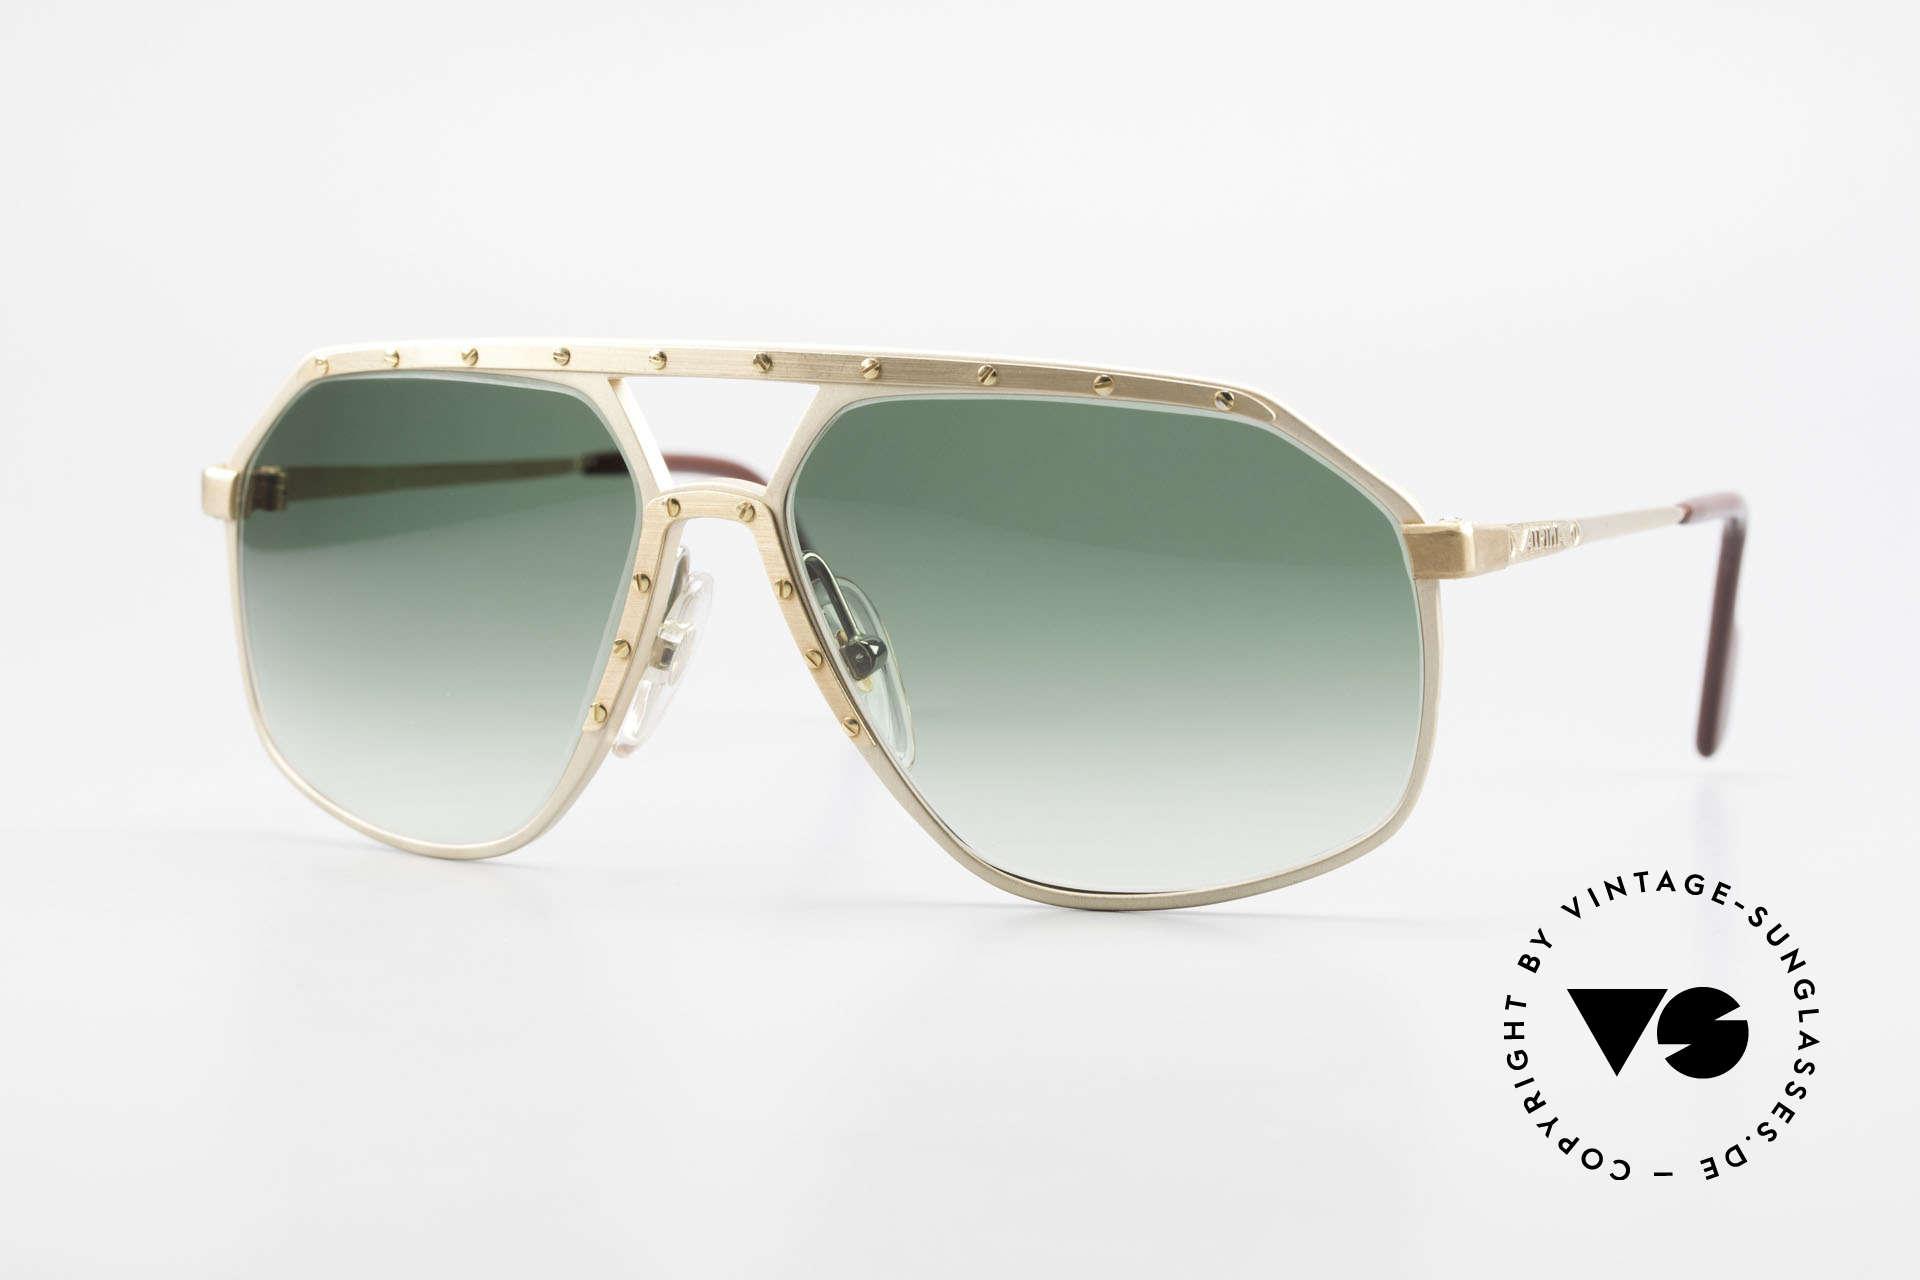 Alpina M6 Legendary 80's Sunglasses, legendary Alpina M6 vintage designer sunglasses, Made for Men